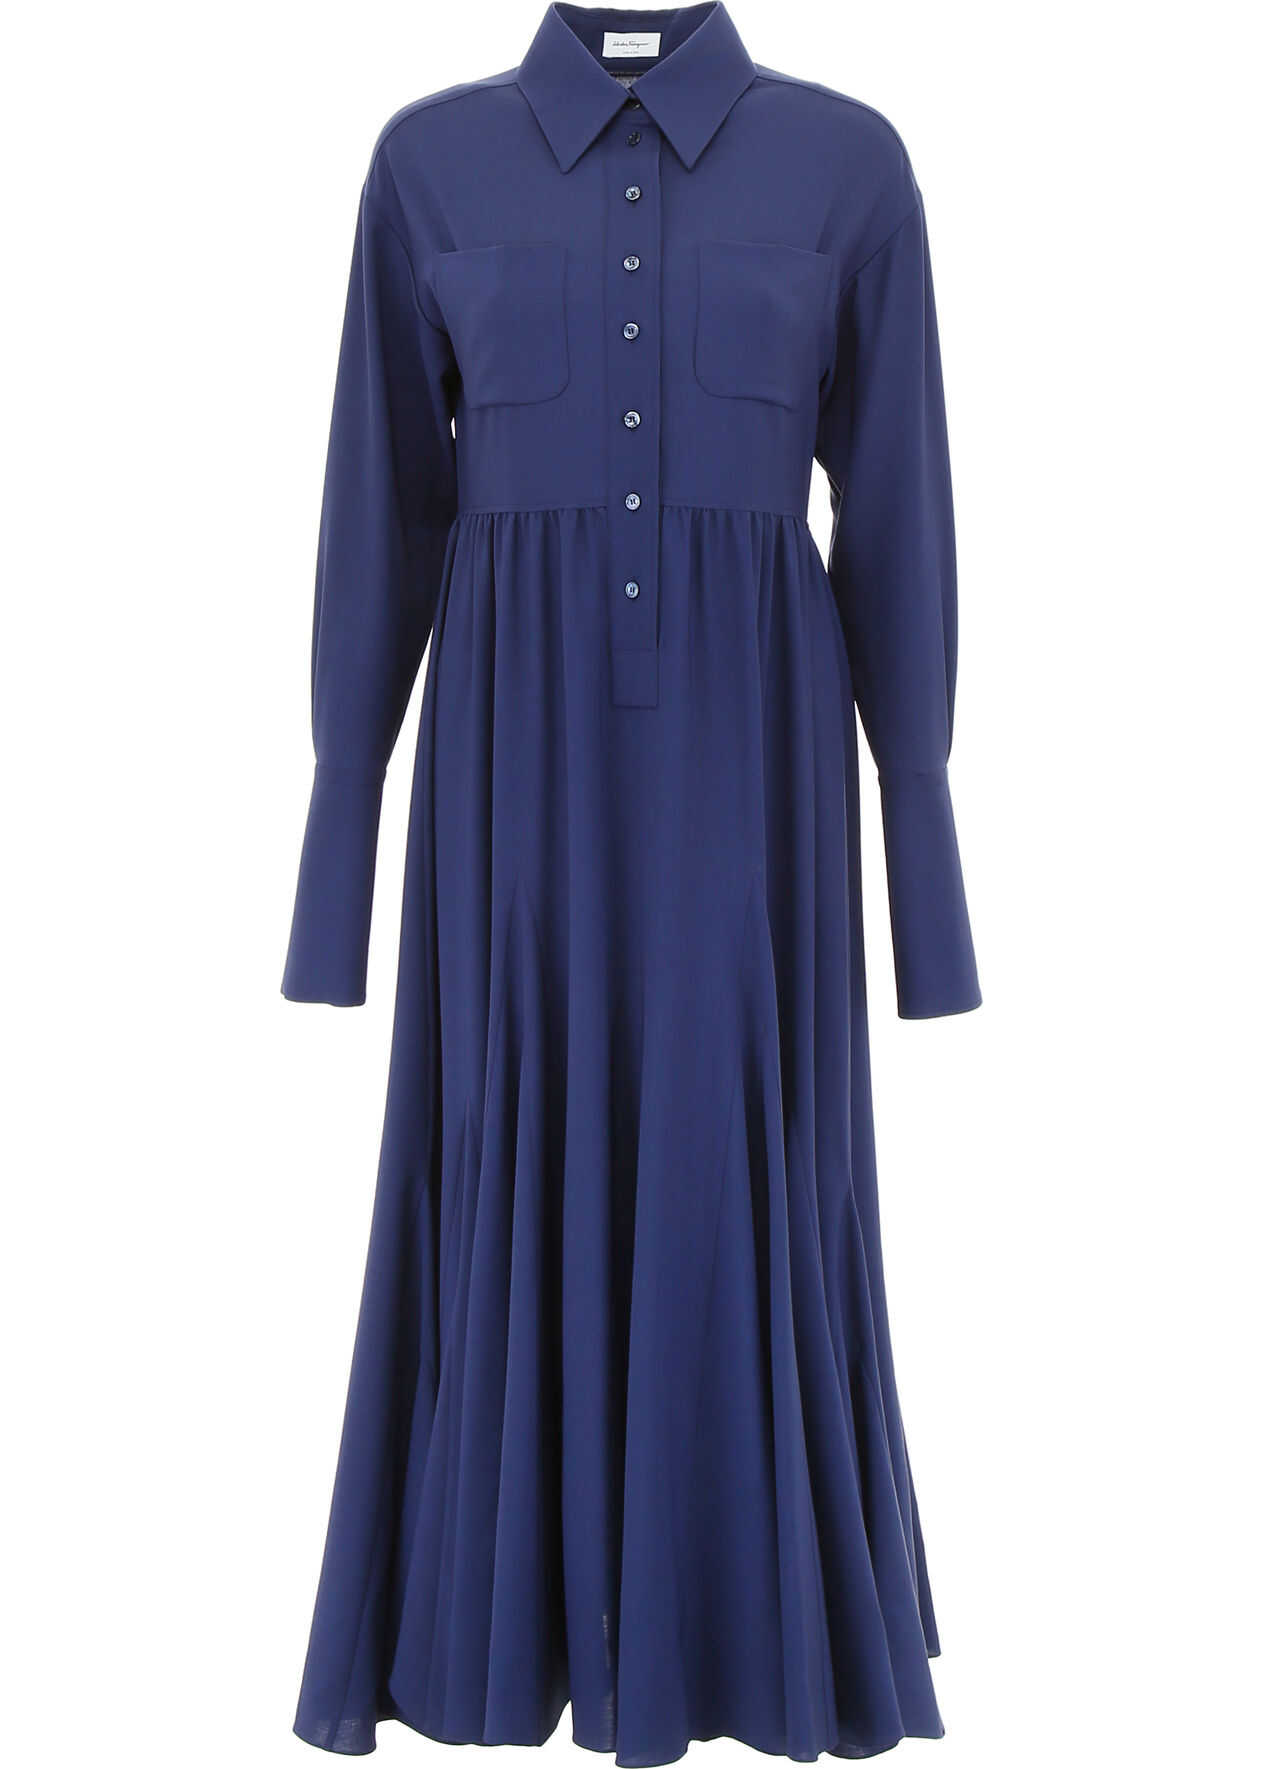 Salvatore Ferragamo Wool Dress BERLIN BLUE